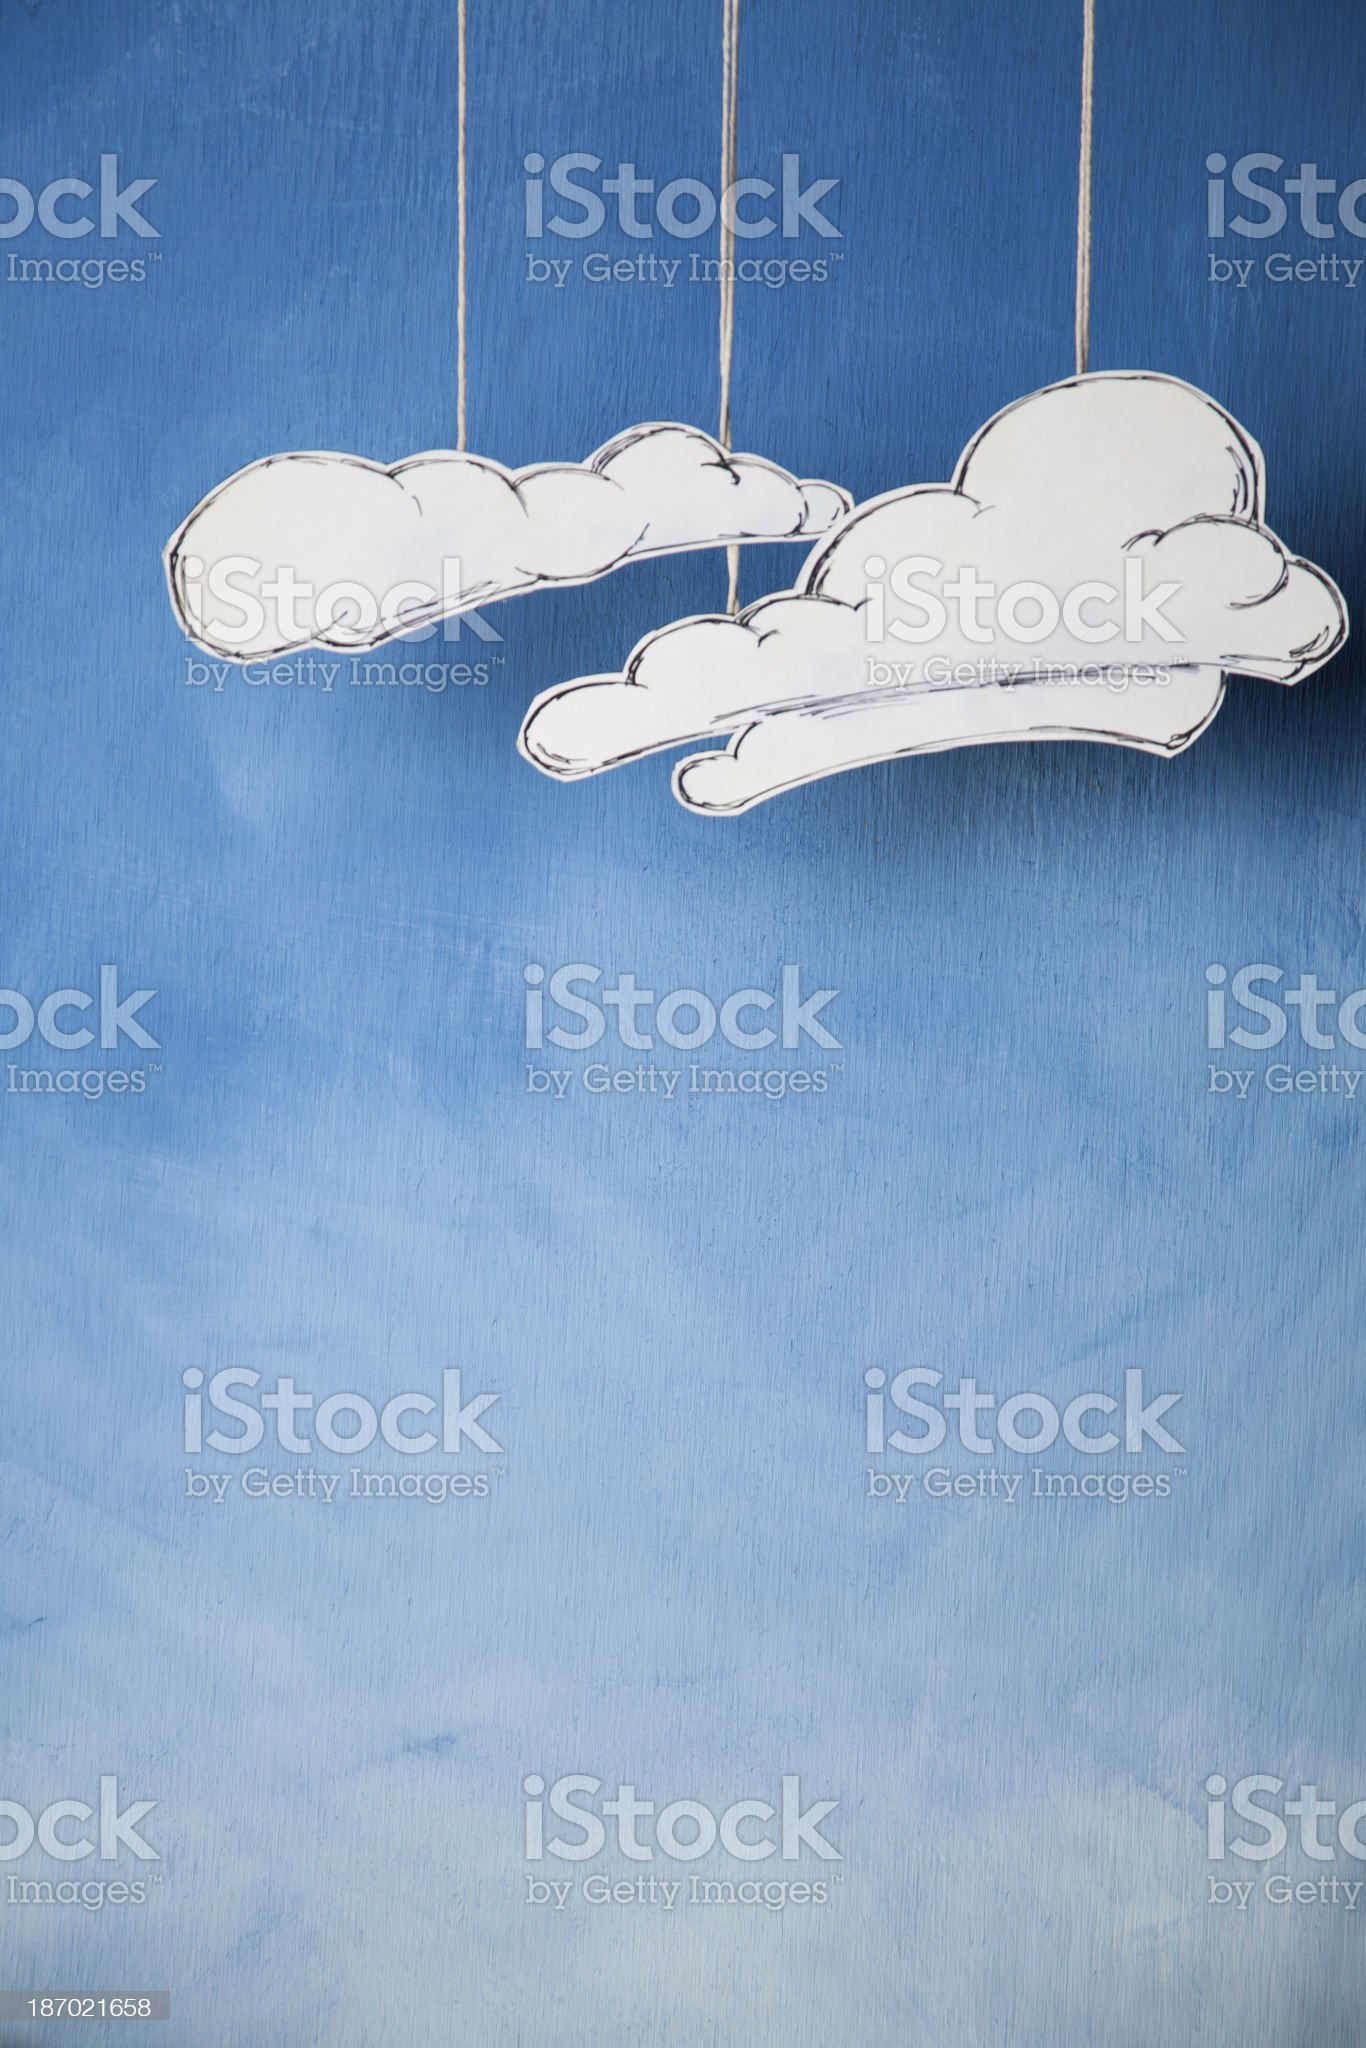 Drawn World: Cloudy Sky royalty-free stock photo